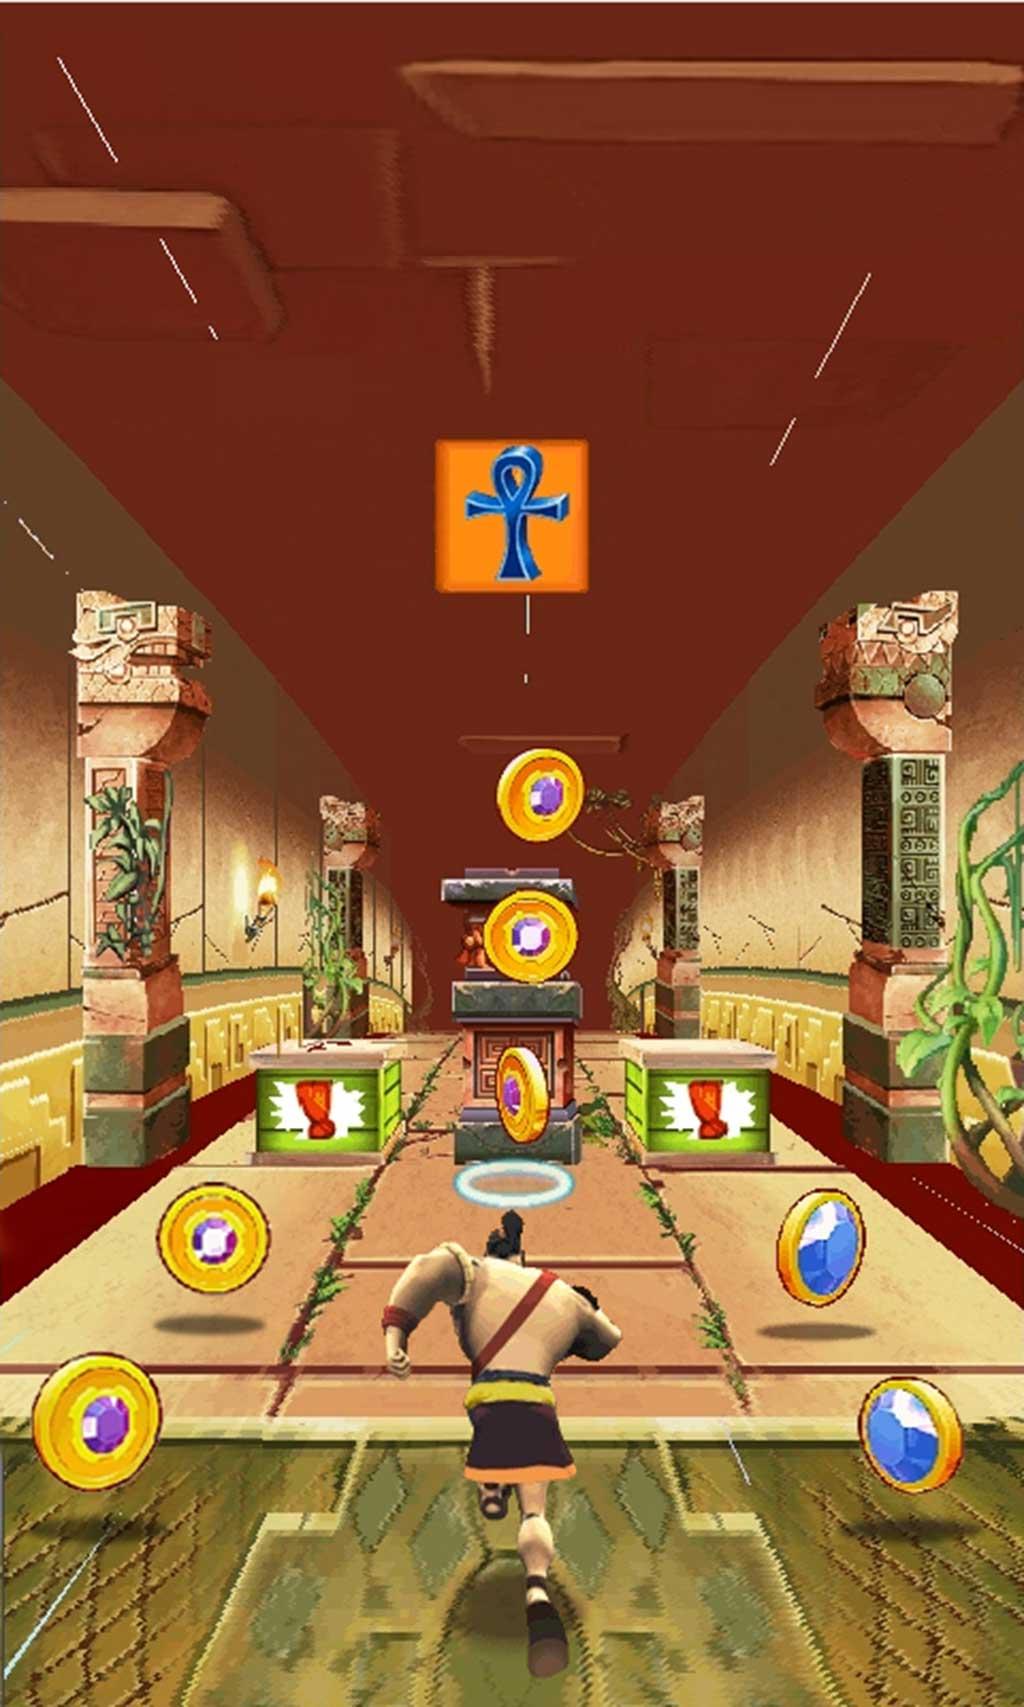 nokia 215 games code